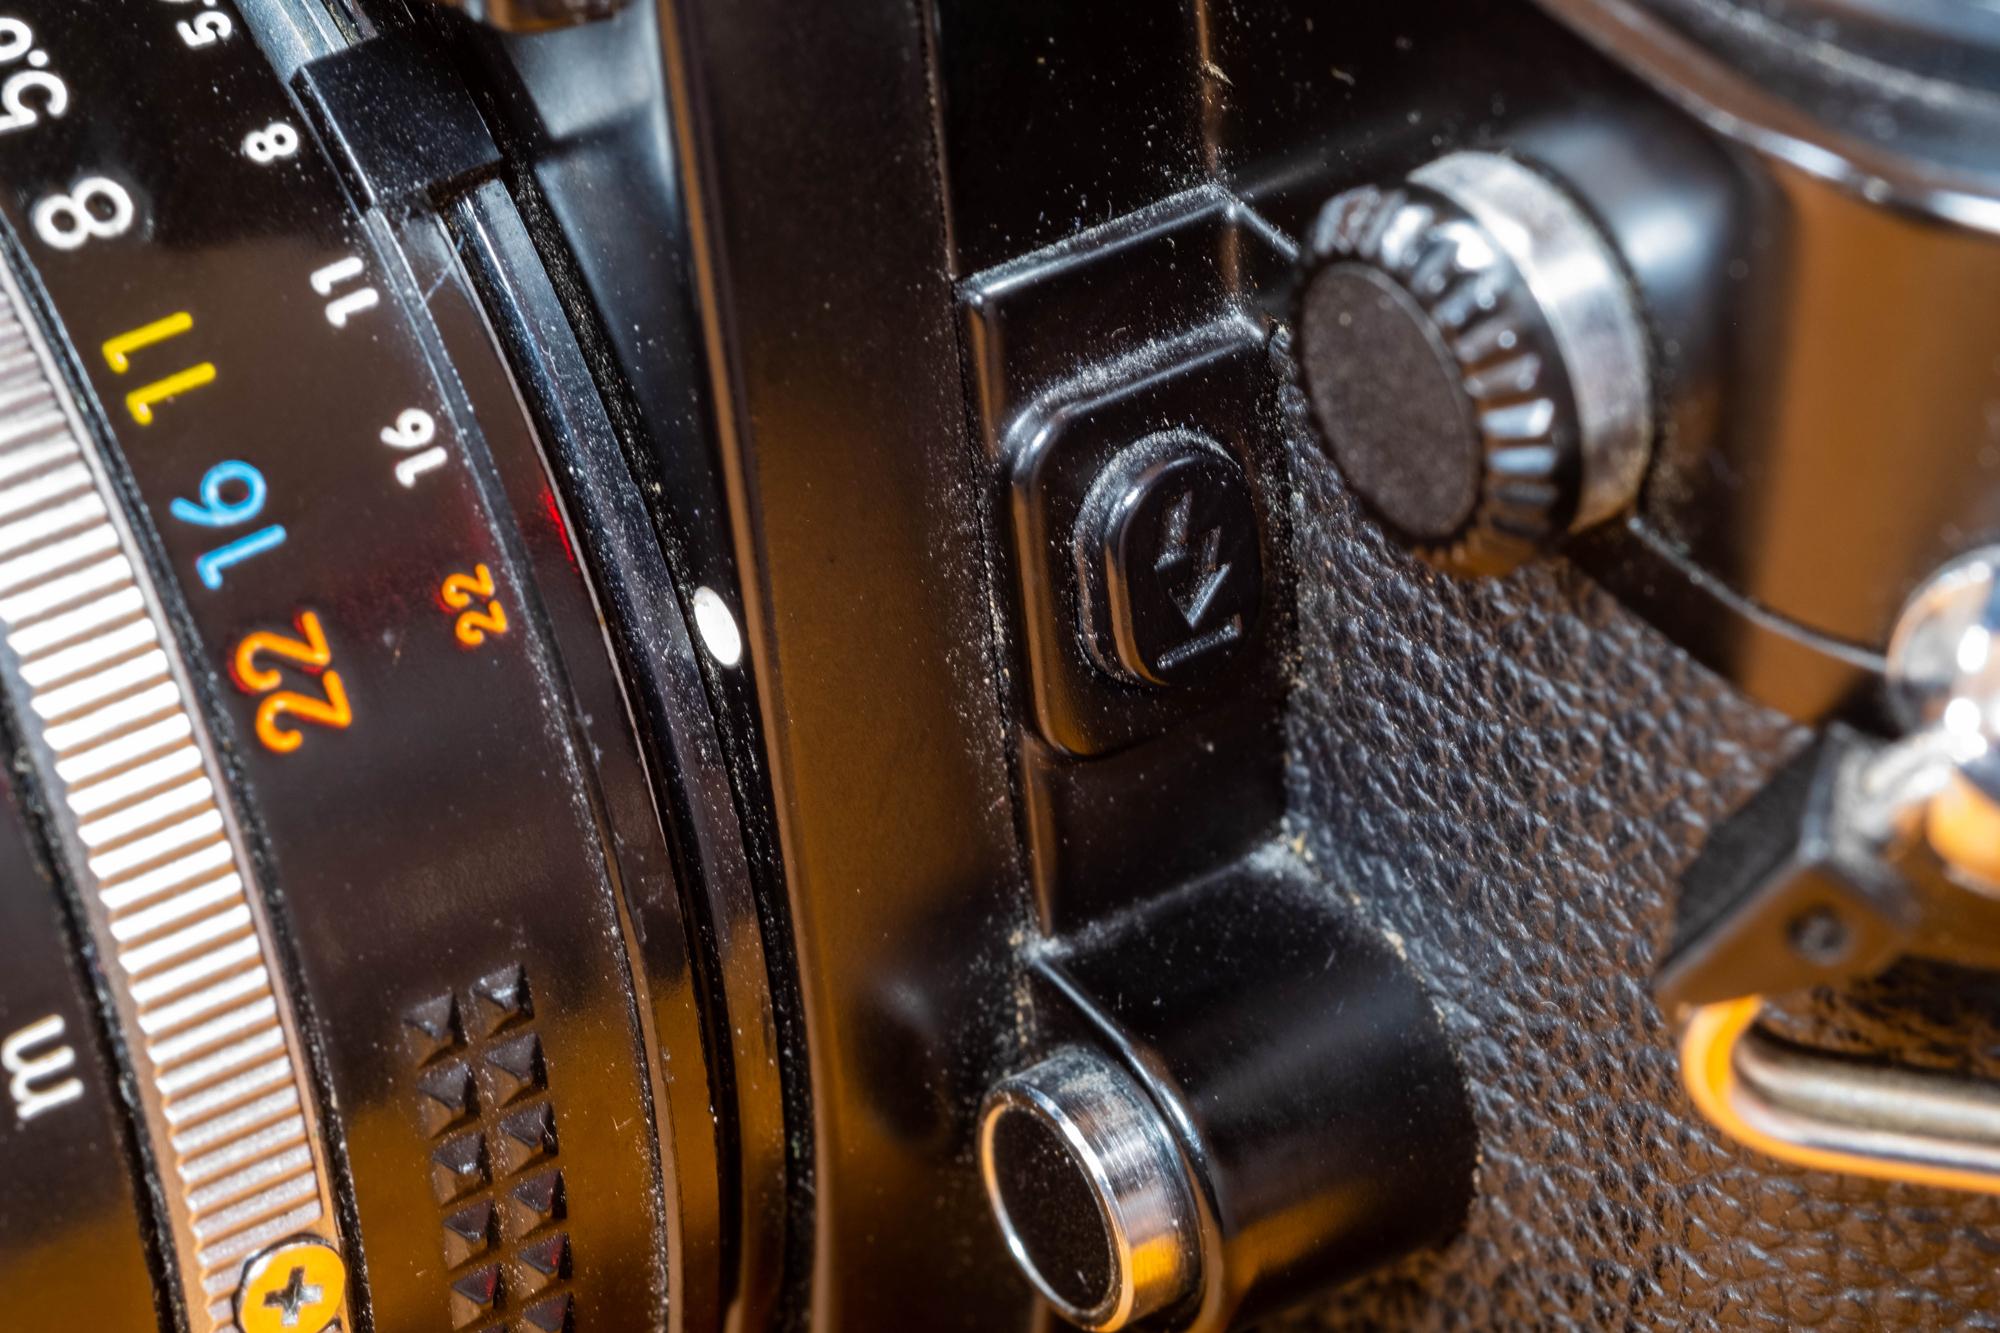 Classic Cameras: The Nikon FM3a | B&H Explora